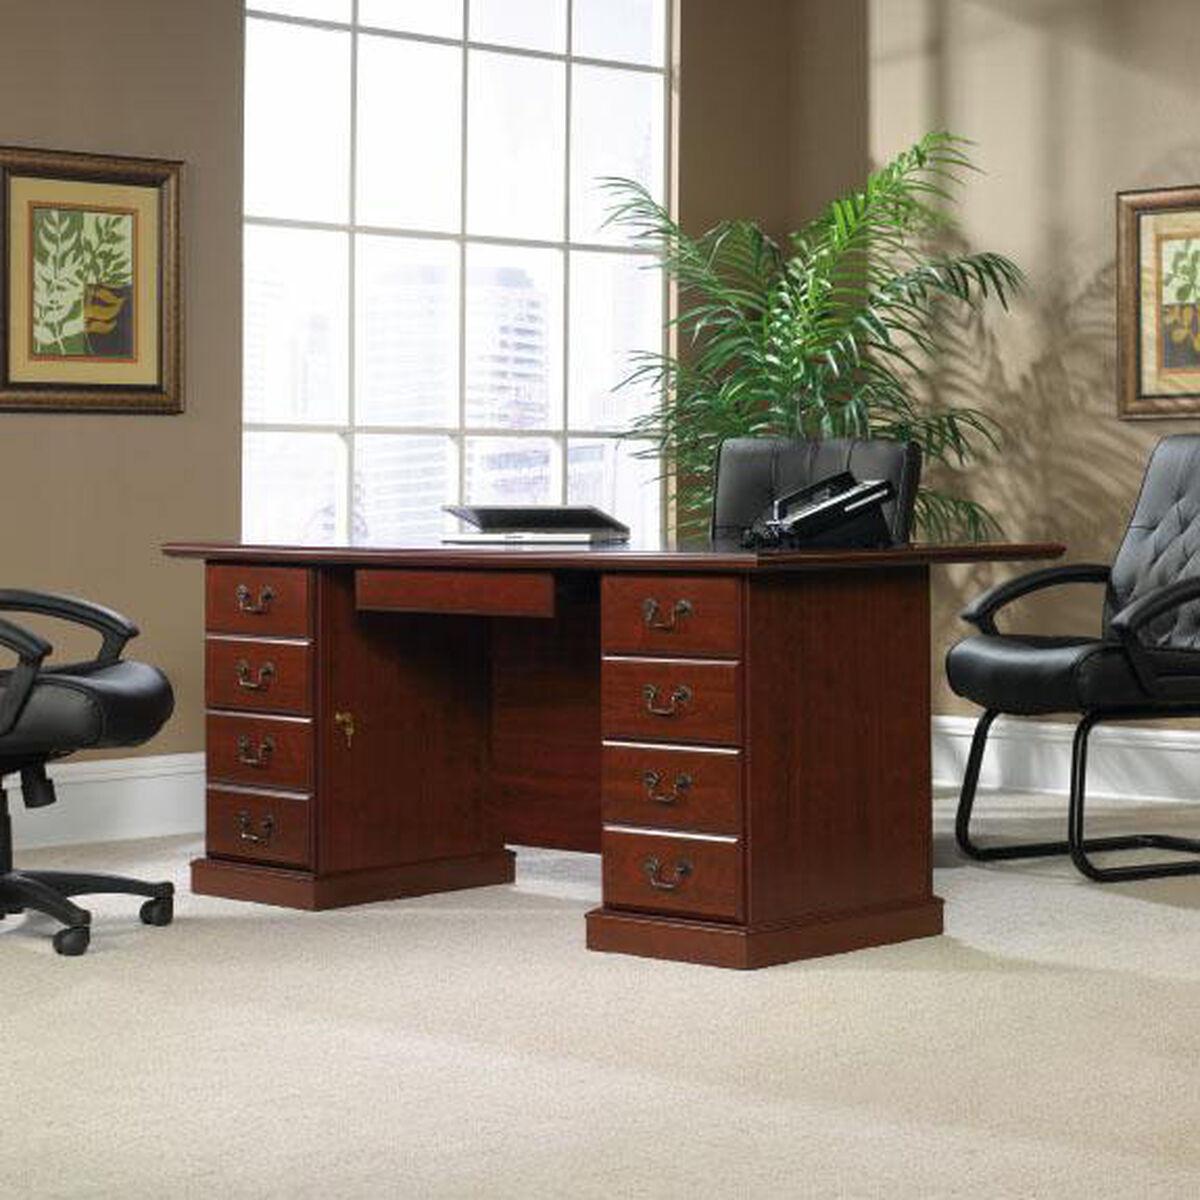 Executive Desk With Lock Drawers 109843 Bizchair Com